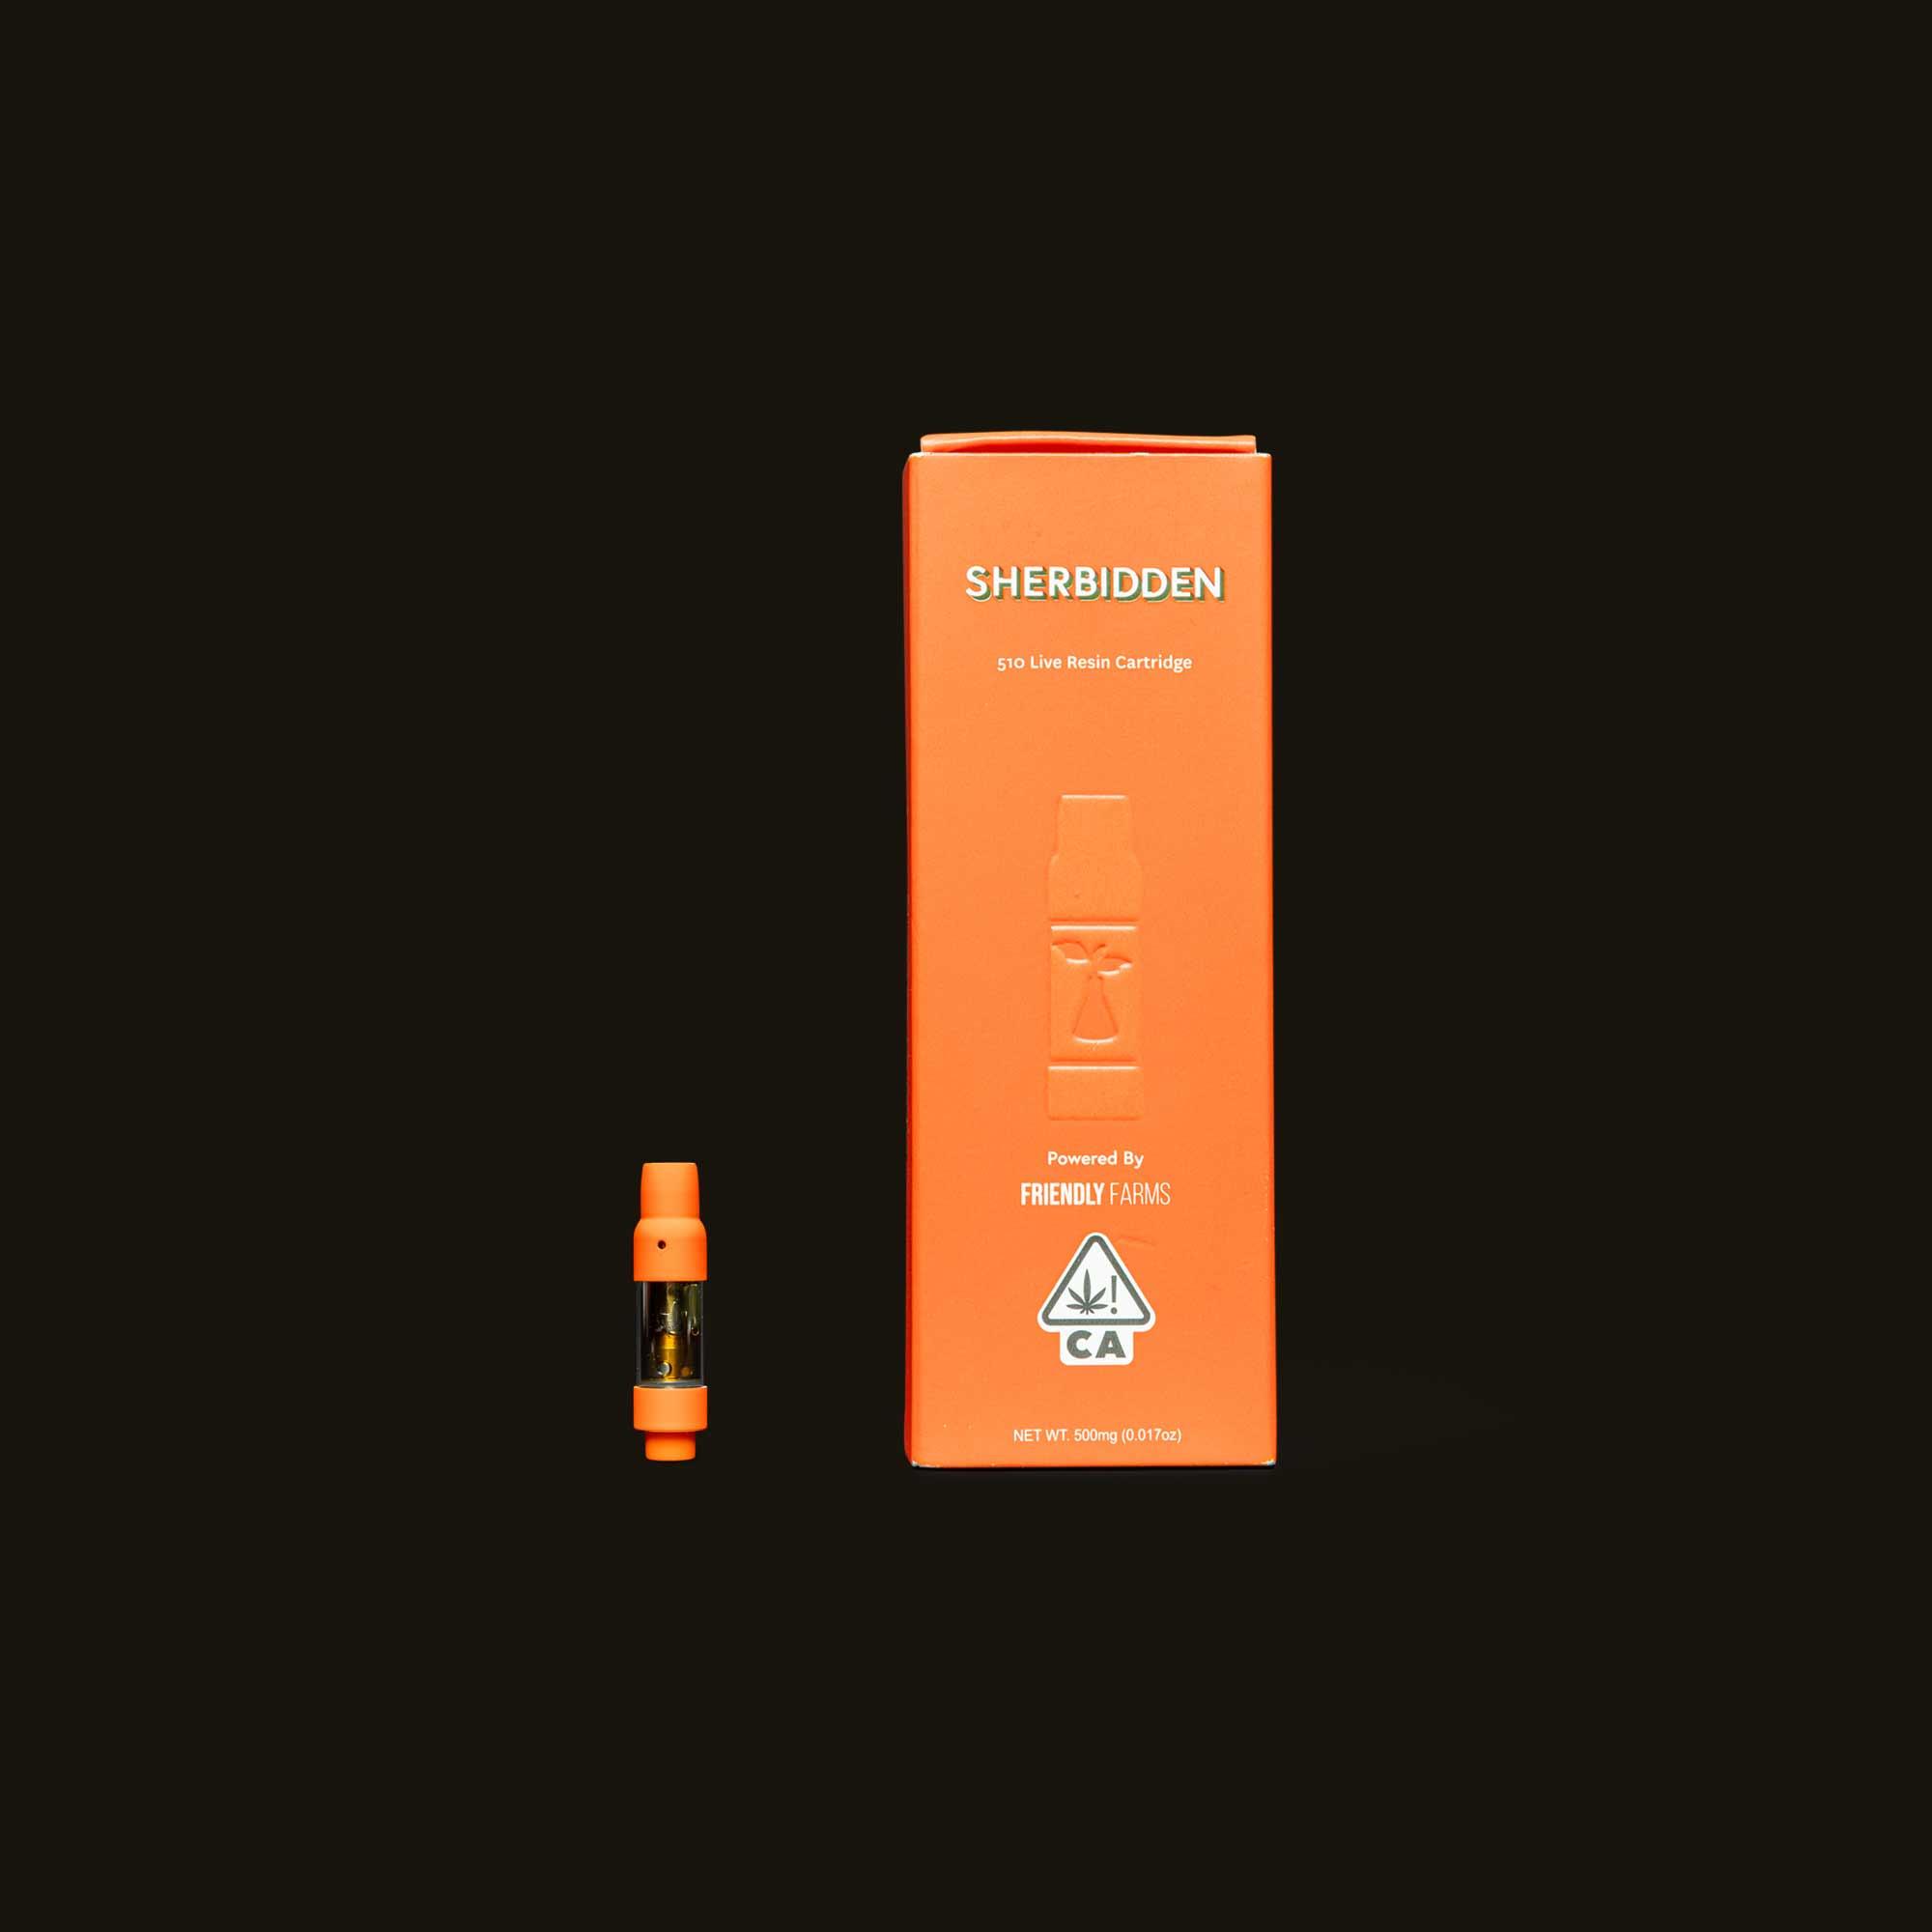 Sherbinskis Sherbidden Live Resin Cartridge